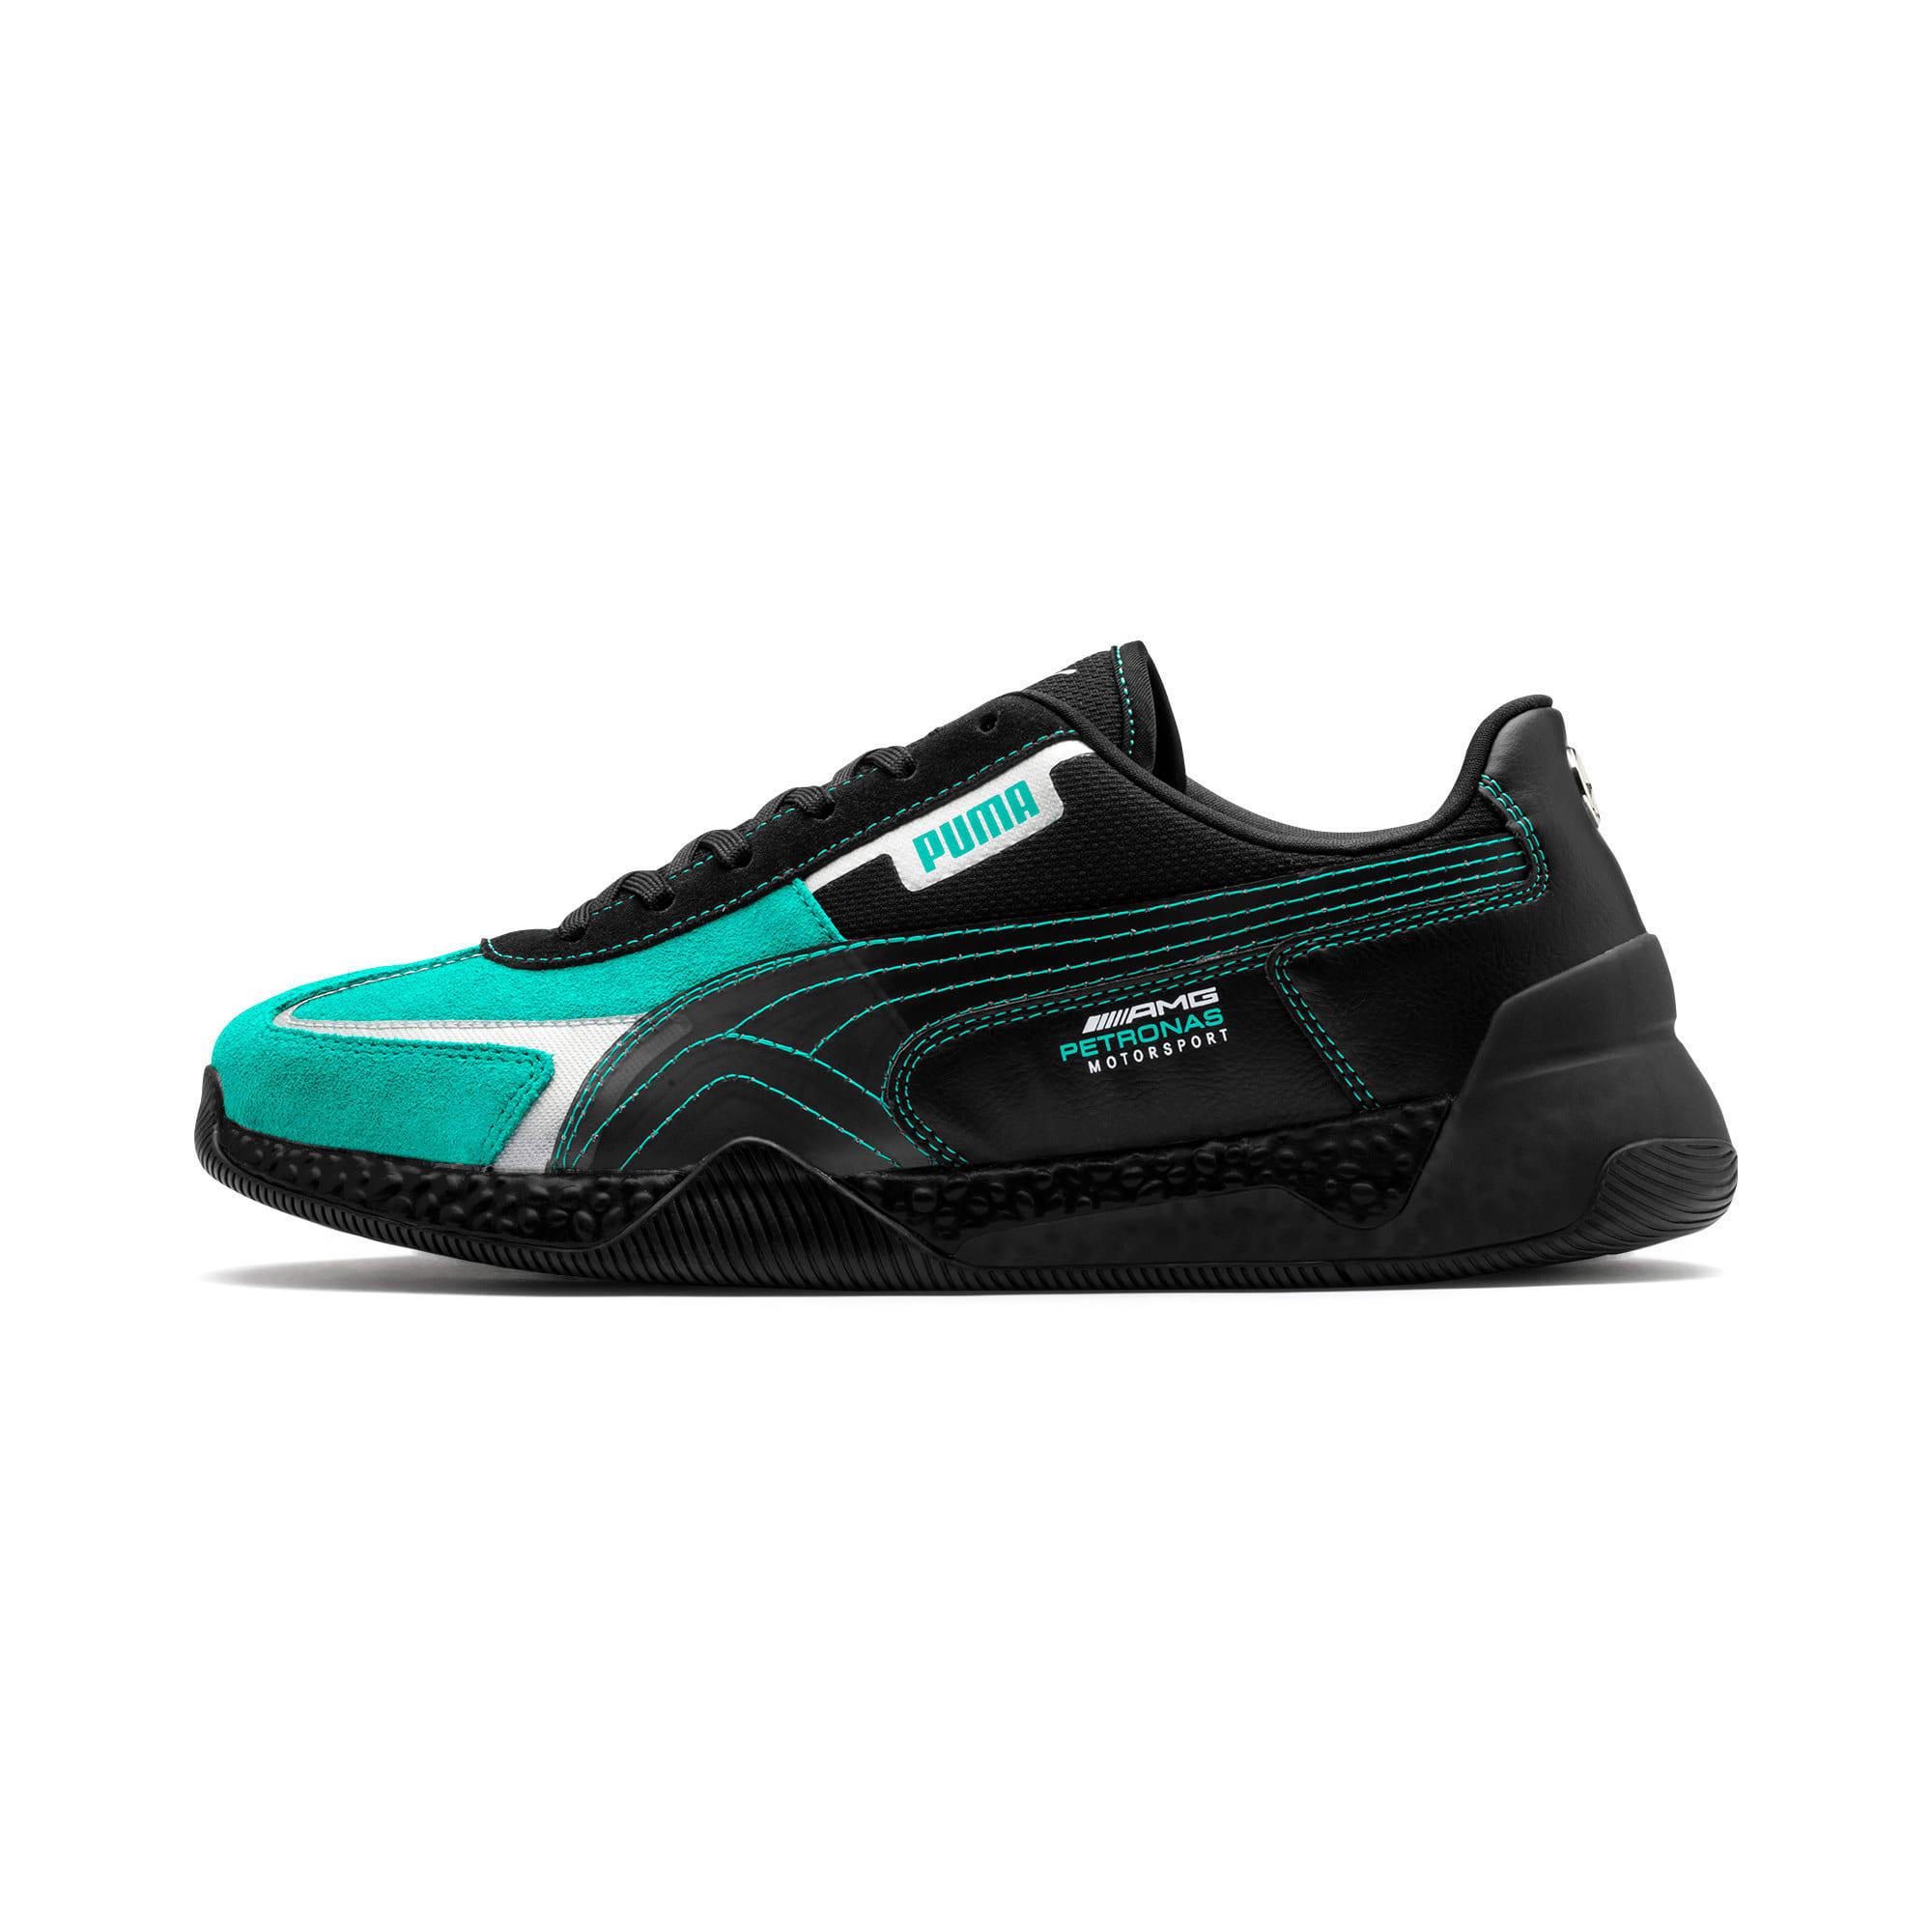 Thumbnail 1 of Mercedes AMG Petronas Motorsport Speed HYBRID Men's Trainers, Puma Black-Spectra Green, medium-IND